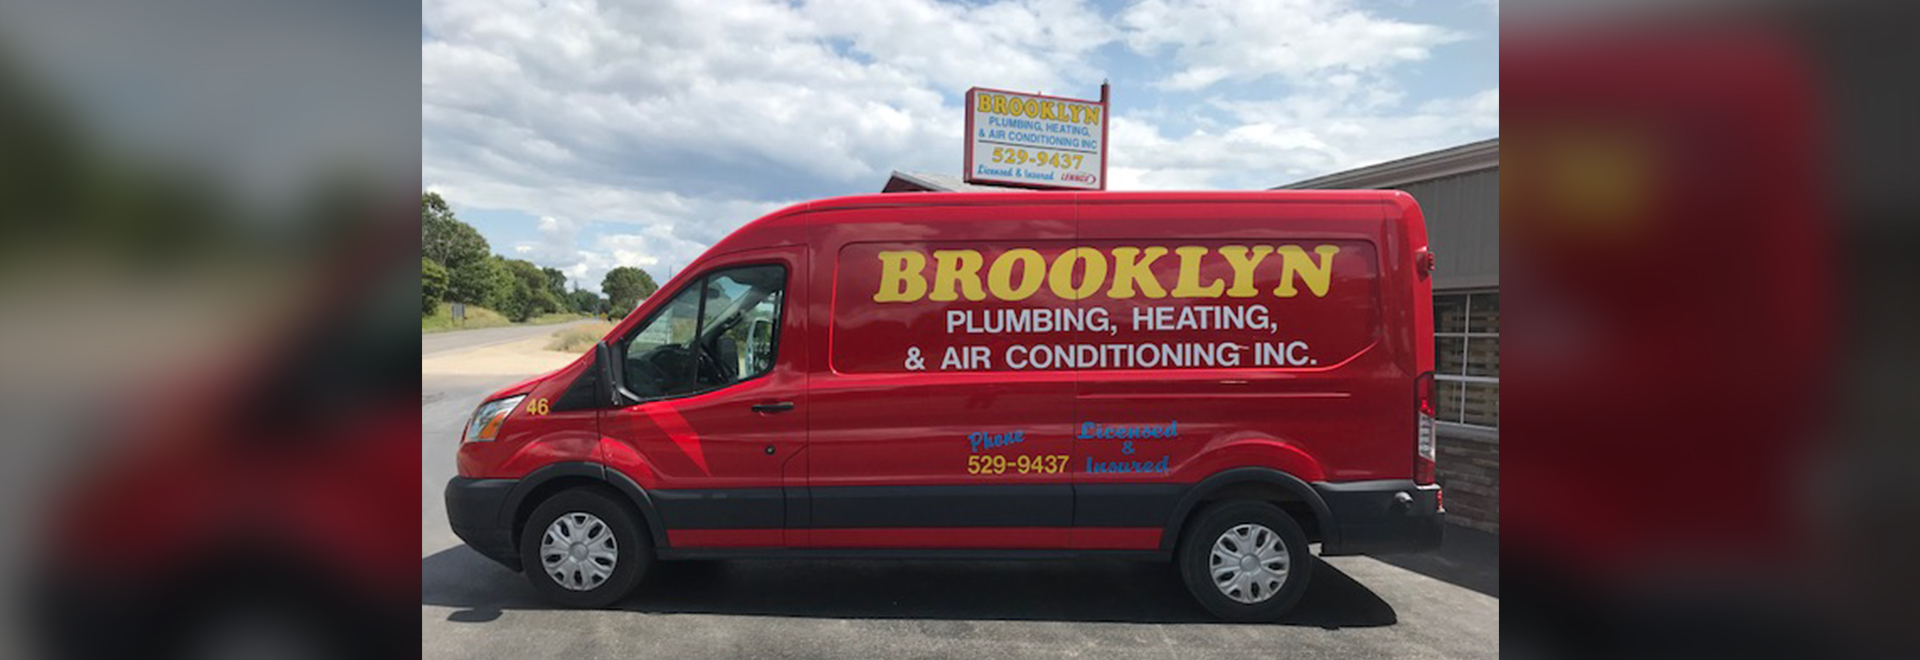 Brooklyn Plumbing, Heating & A/C